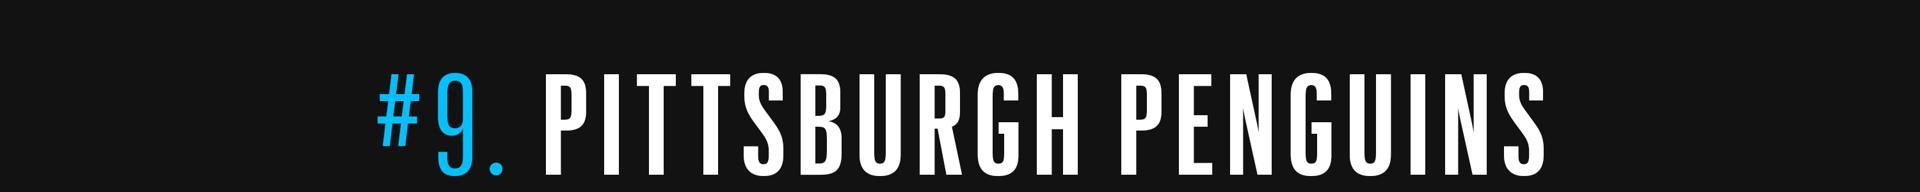 9-pittsburgh